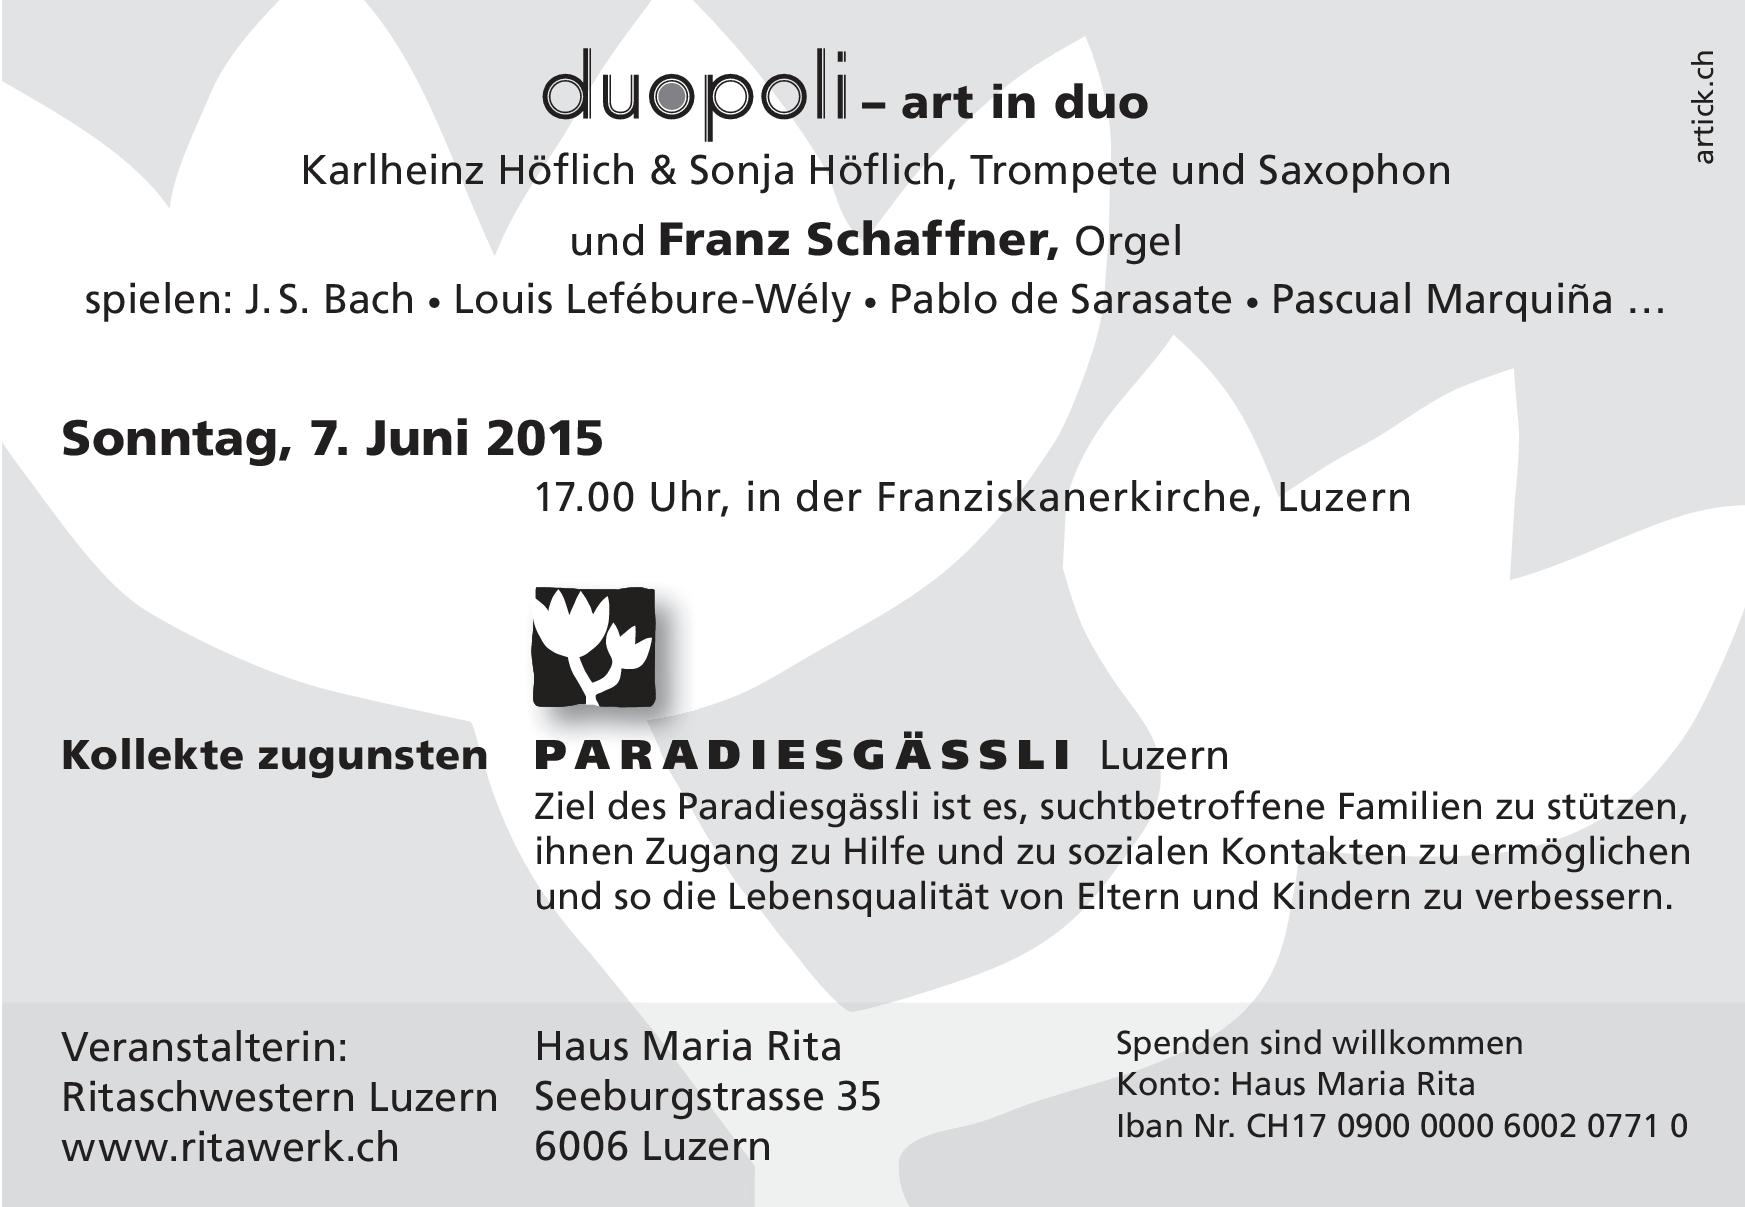 Benefizkonzert Luzern_duopoli_Franziskanerkirche-002